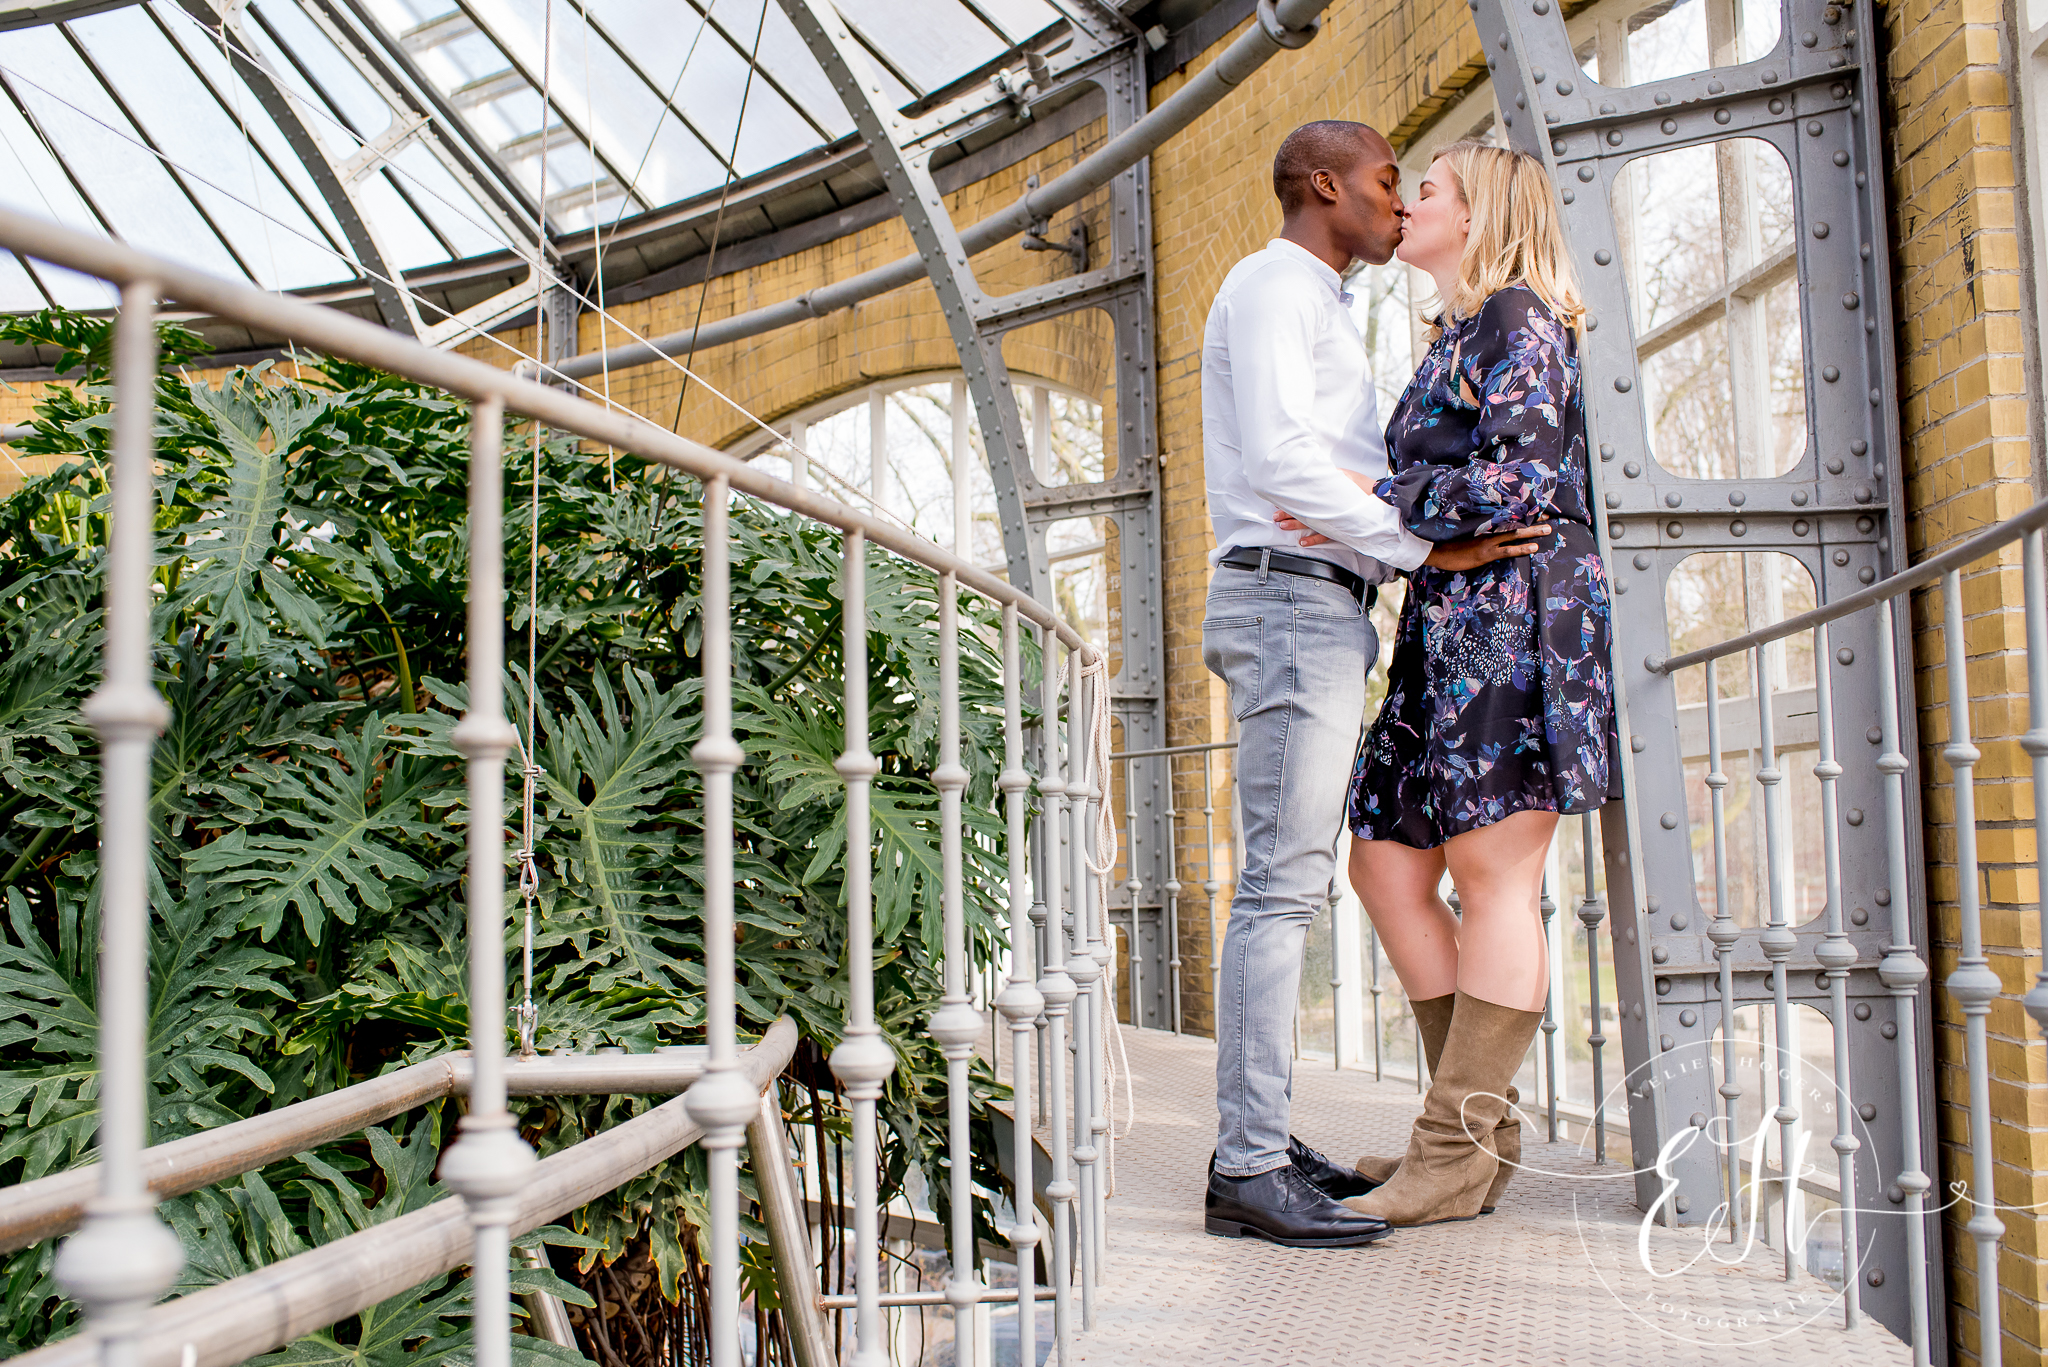 loveshoot-hortus-botanicus.jpg